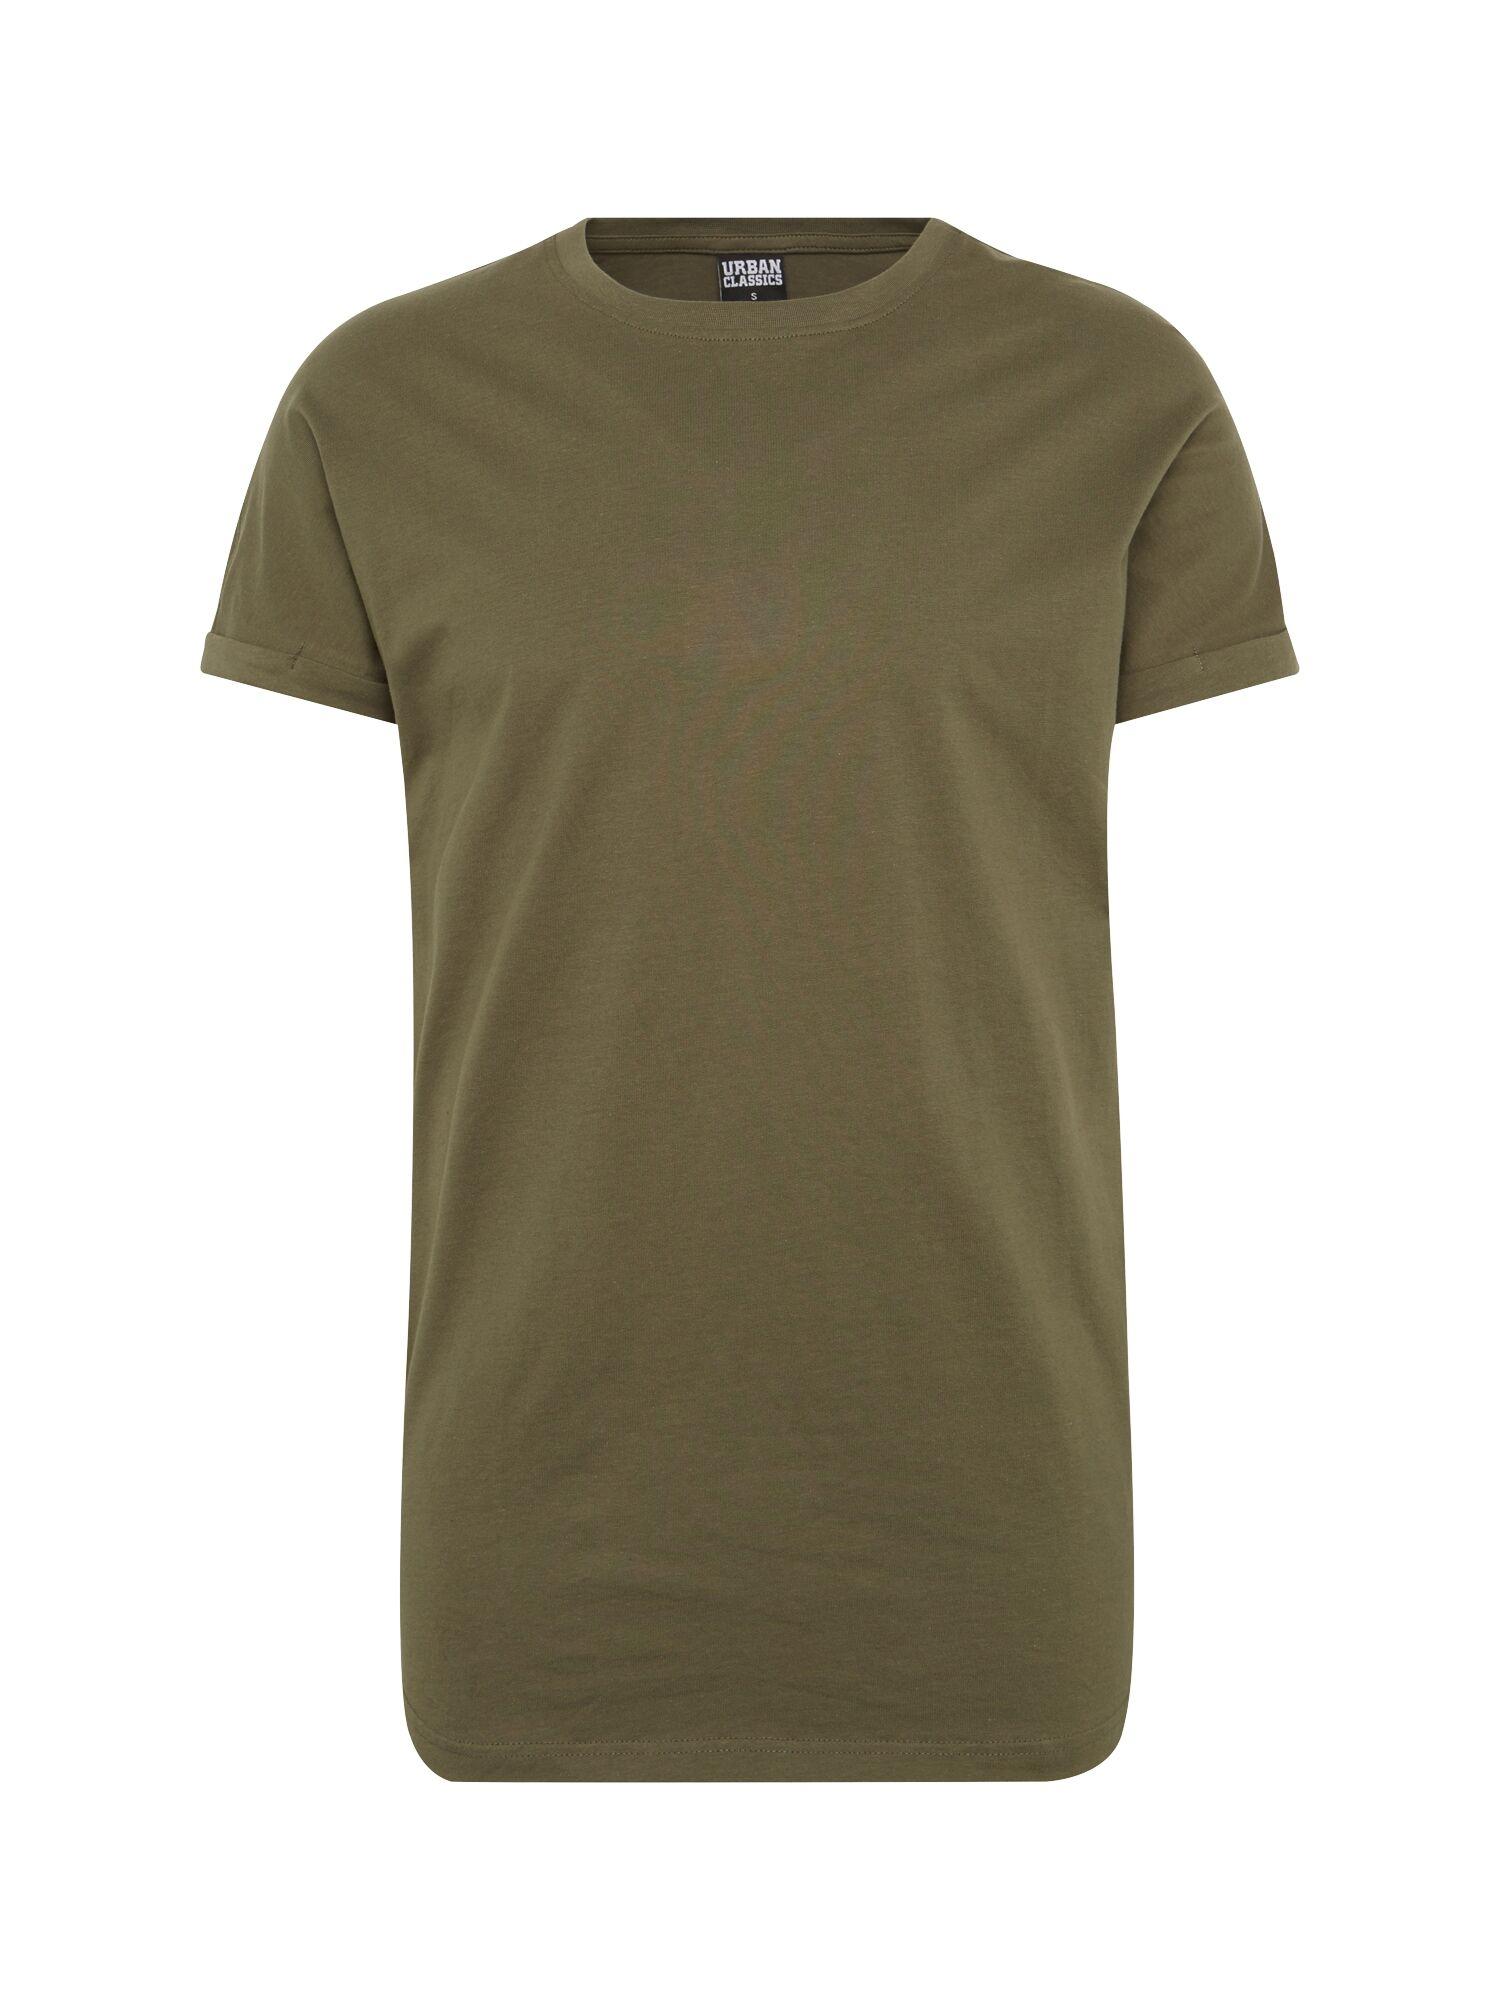 Urban Classics T-Shirt  - Vert - Taille: XXL - male